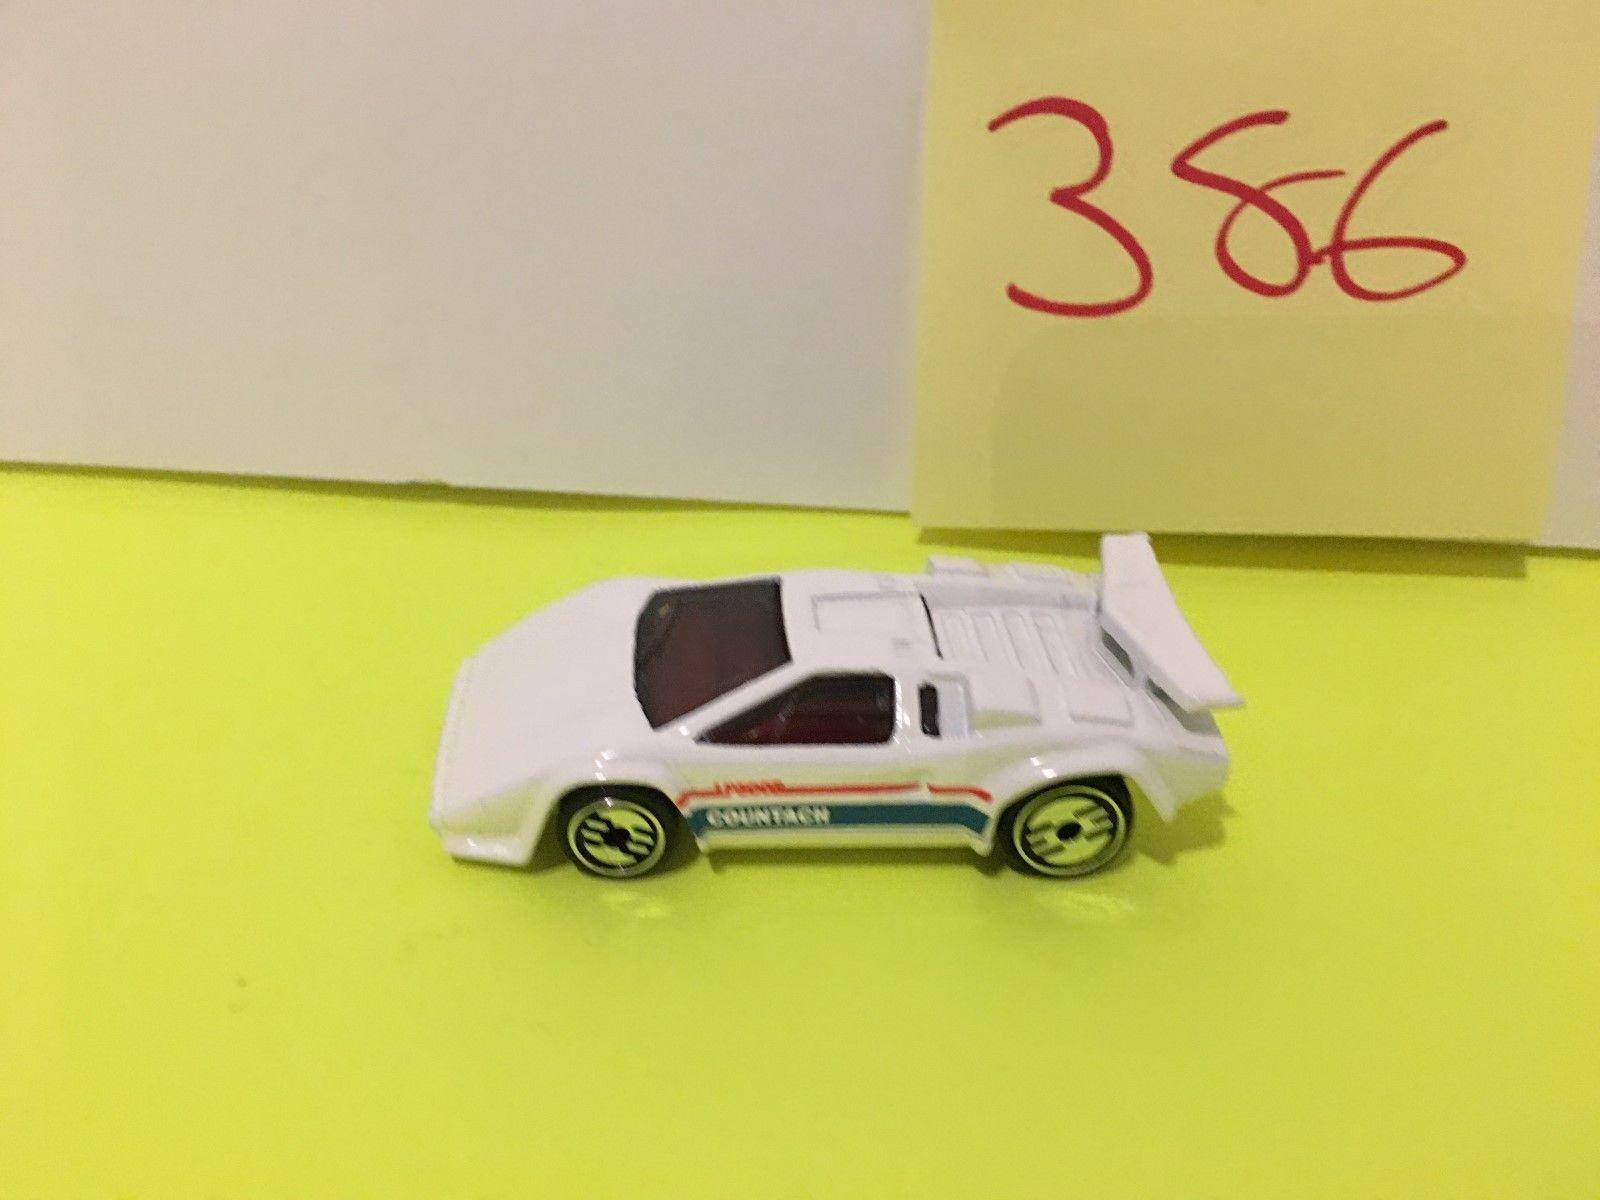 7668618a01e7b02ee9e48ccc979a6b2f Astounding Lamborghini Countach Built In Basement Cars Trend